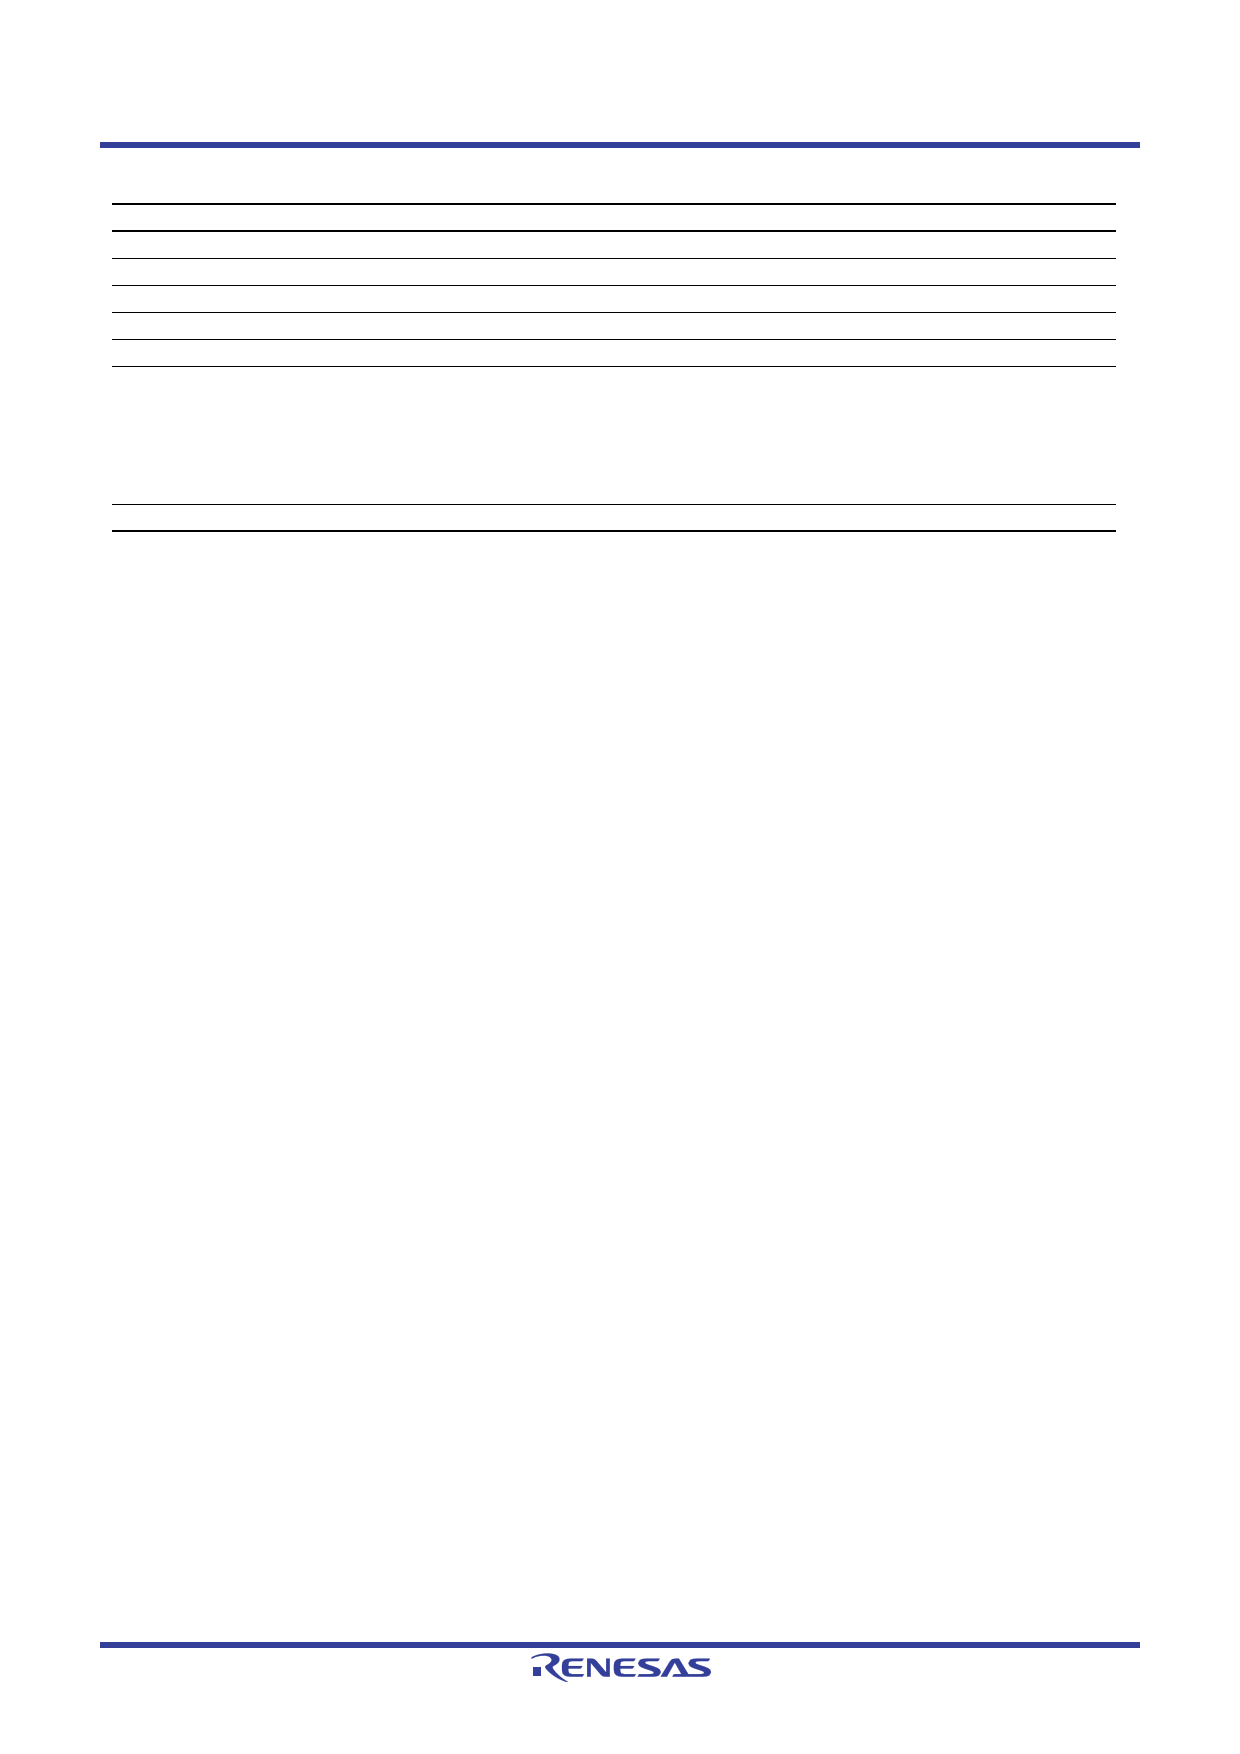 R5F51101ADFK pdf, 반도체, 판매, 대치품